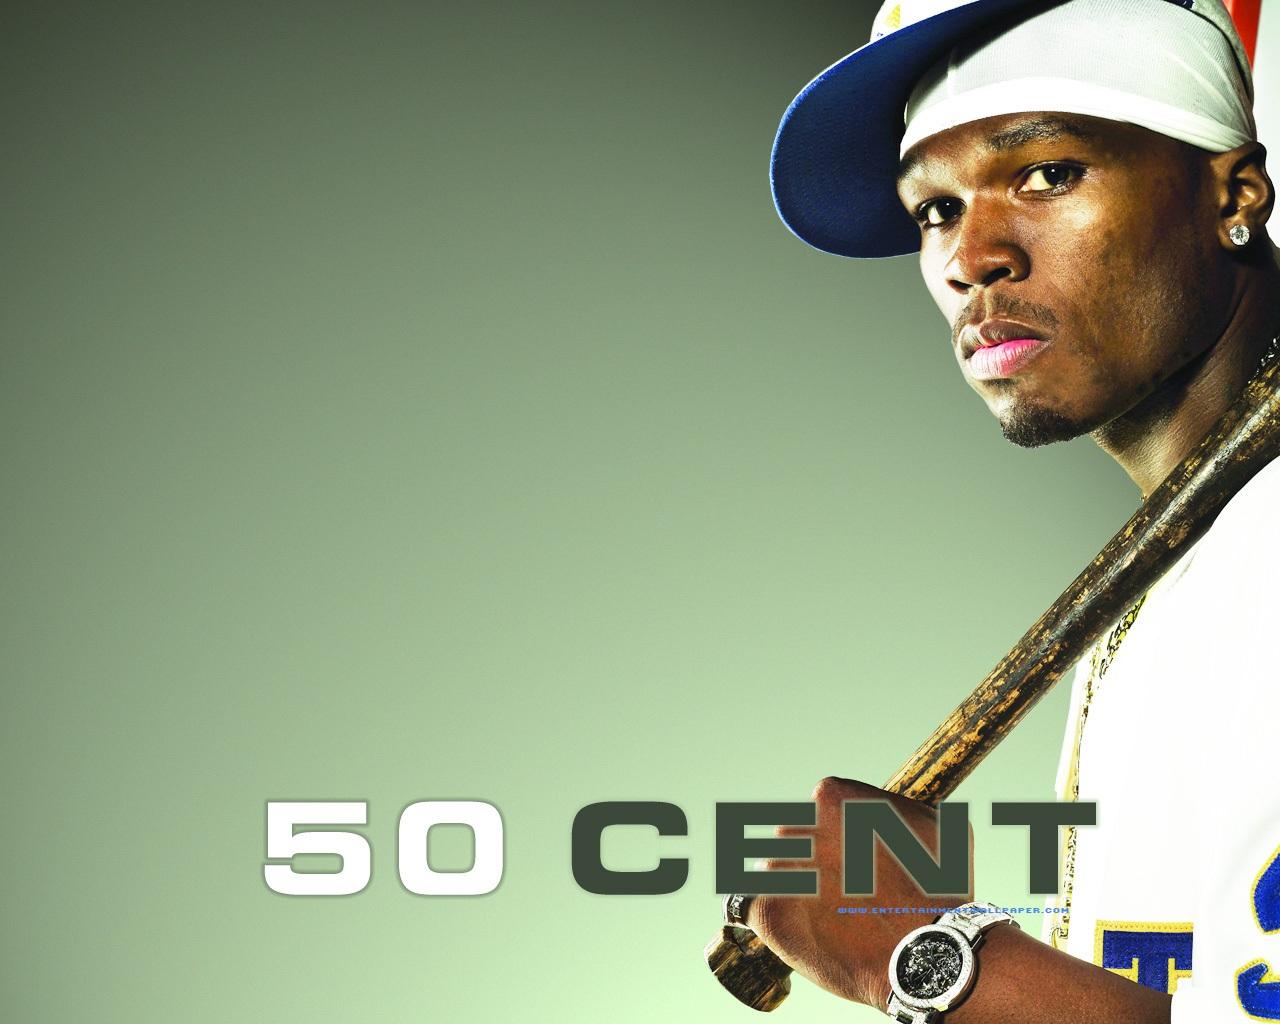 Papel de Parede 50 Cent Wallpaper Wallpaper para Download no Celular ou Computador PC